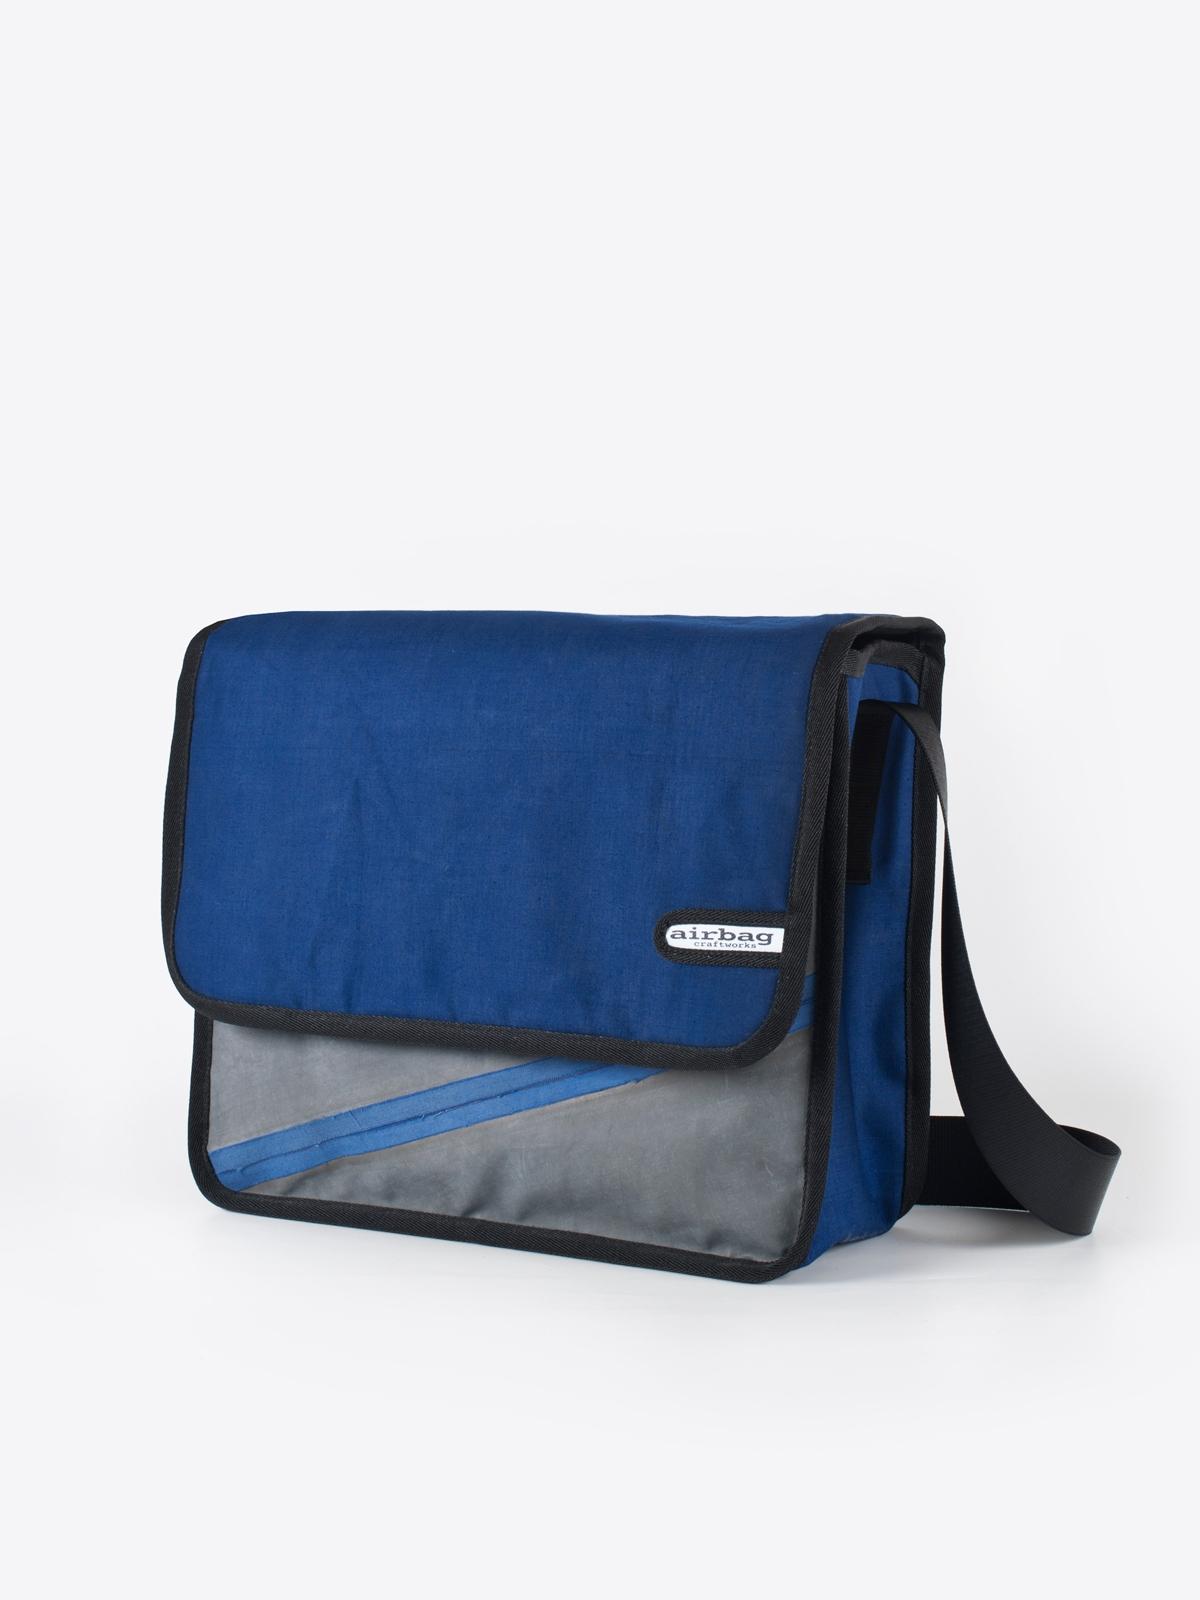 airbag craftworks 705